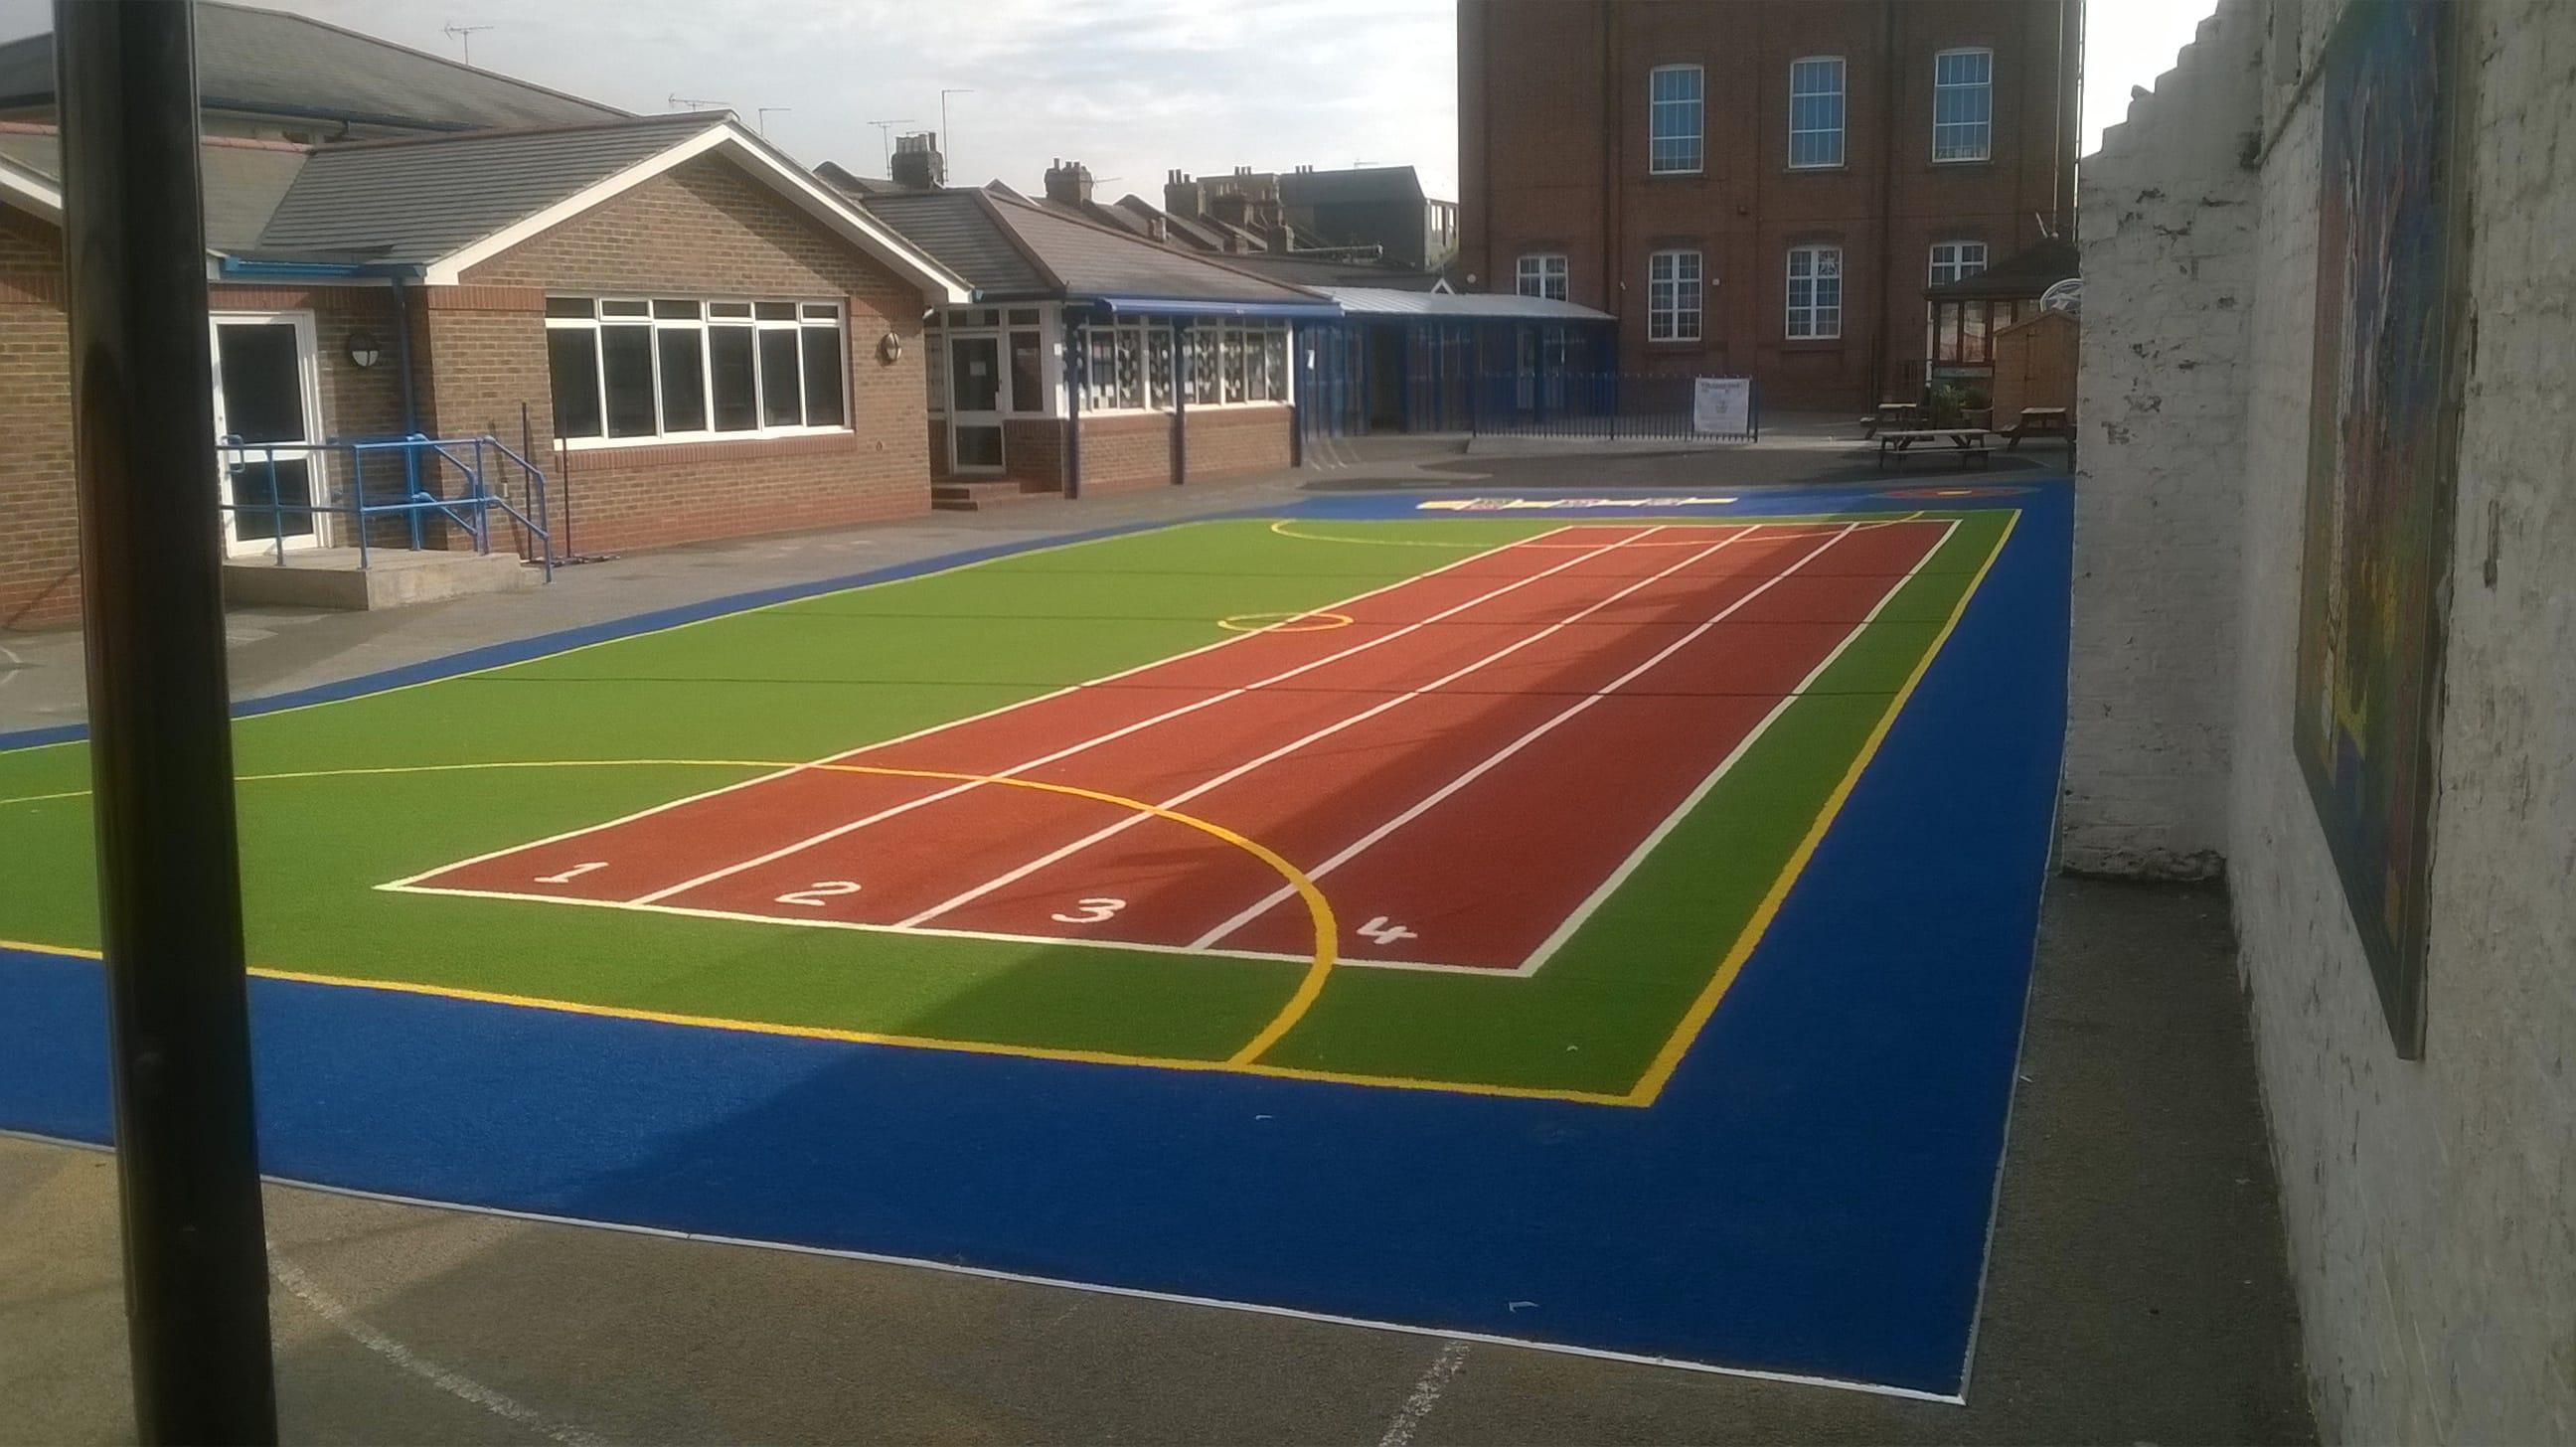 Classroom Design Standards Uk ~ Good shepherd primary school playground surface · stm world